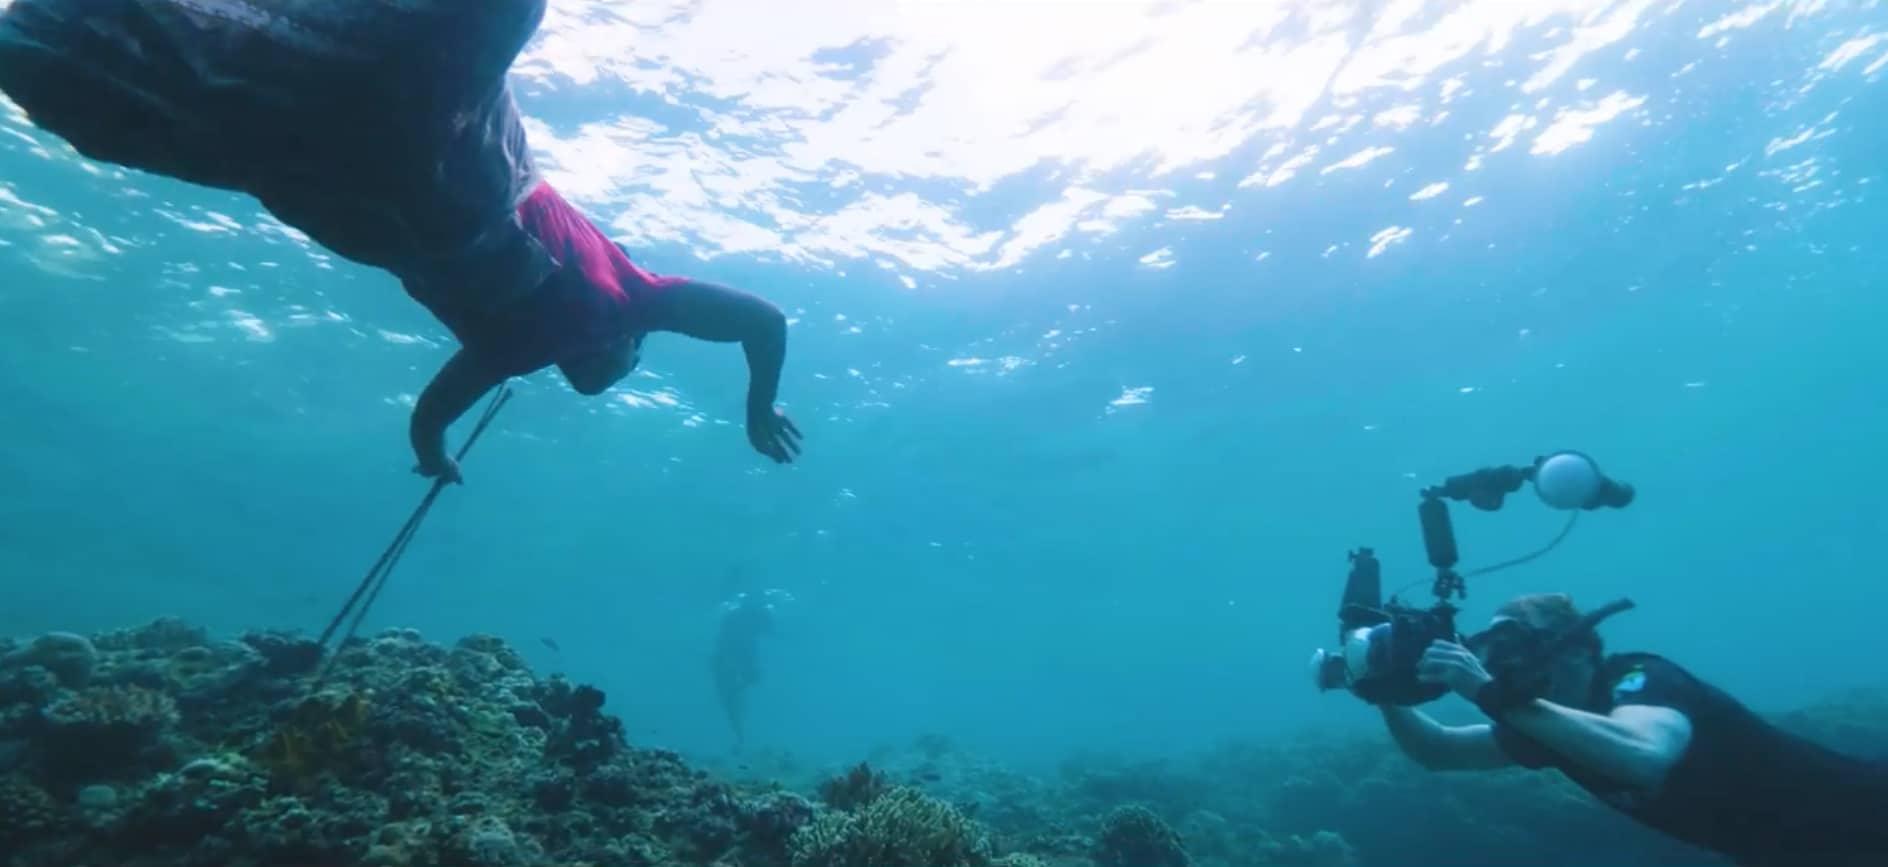 Atauro Dive Resort Featured In ScubaZoo Video